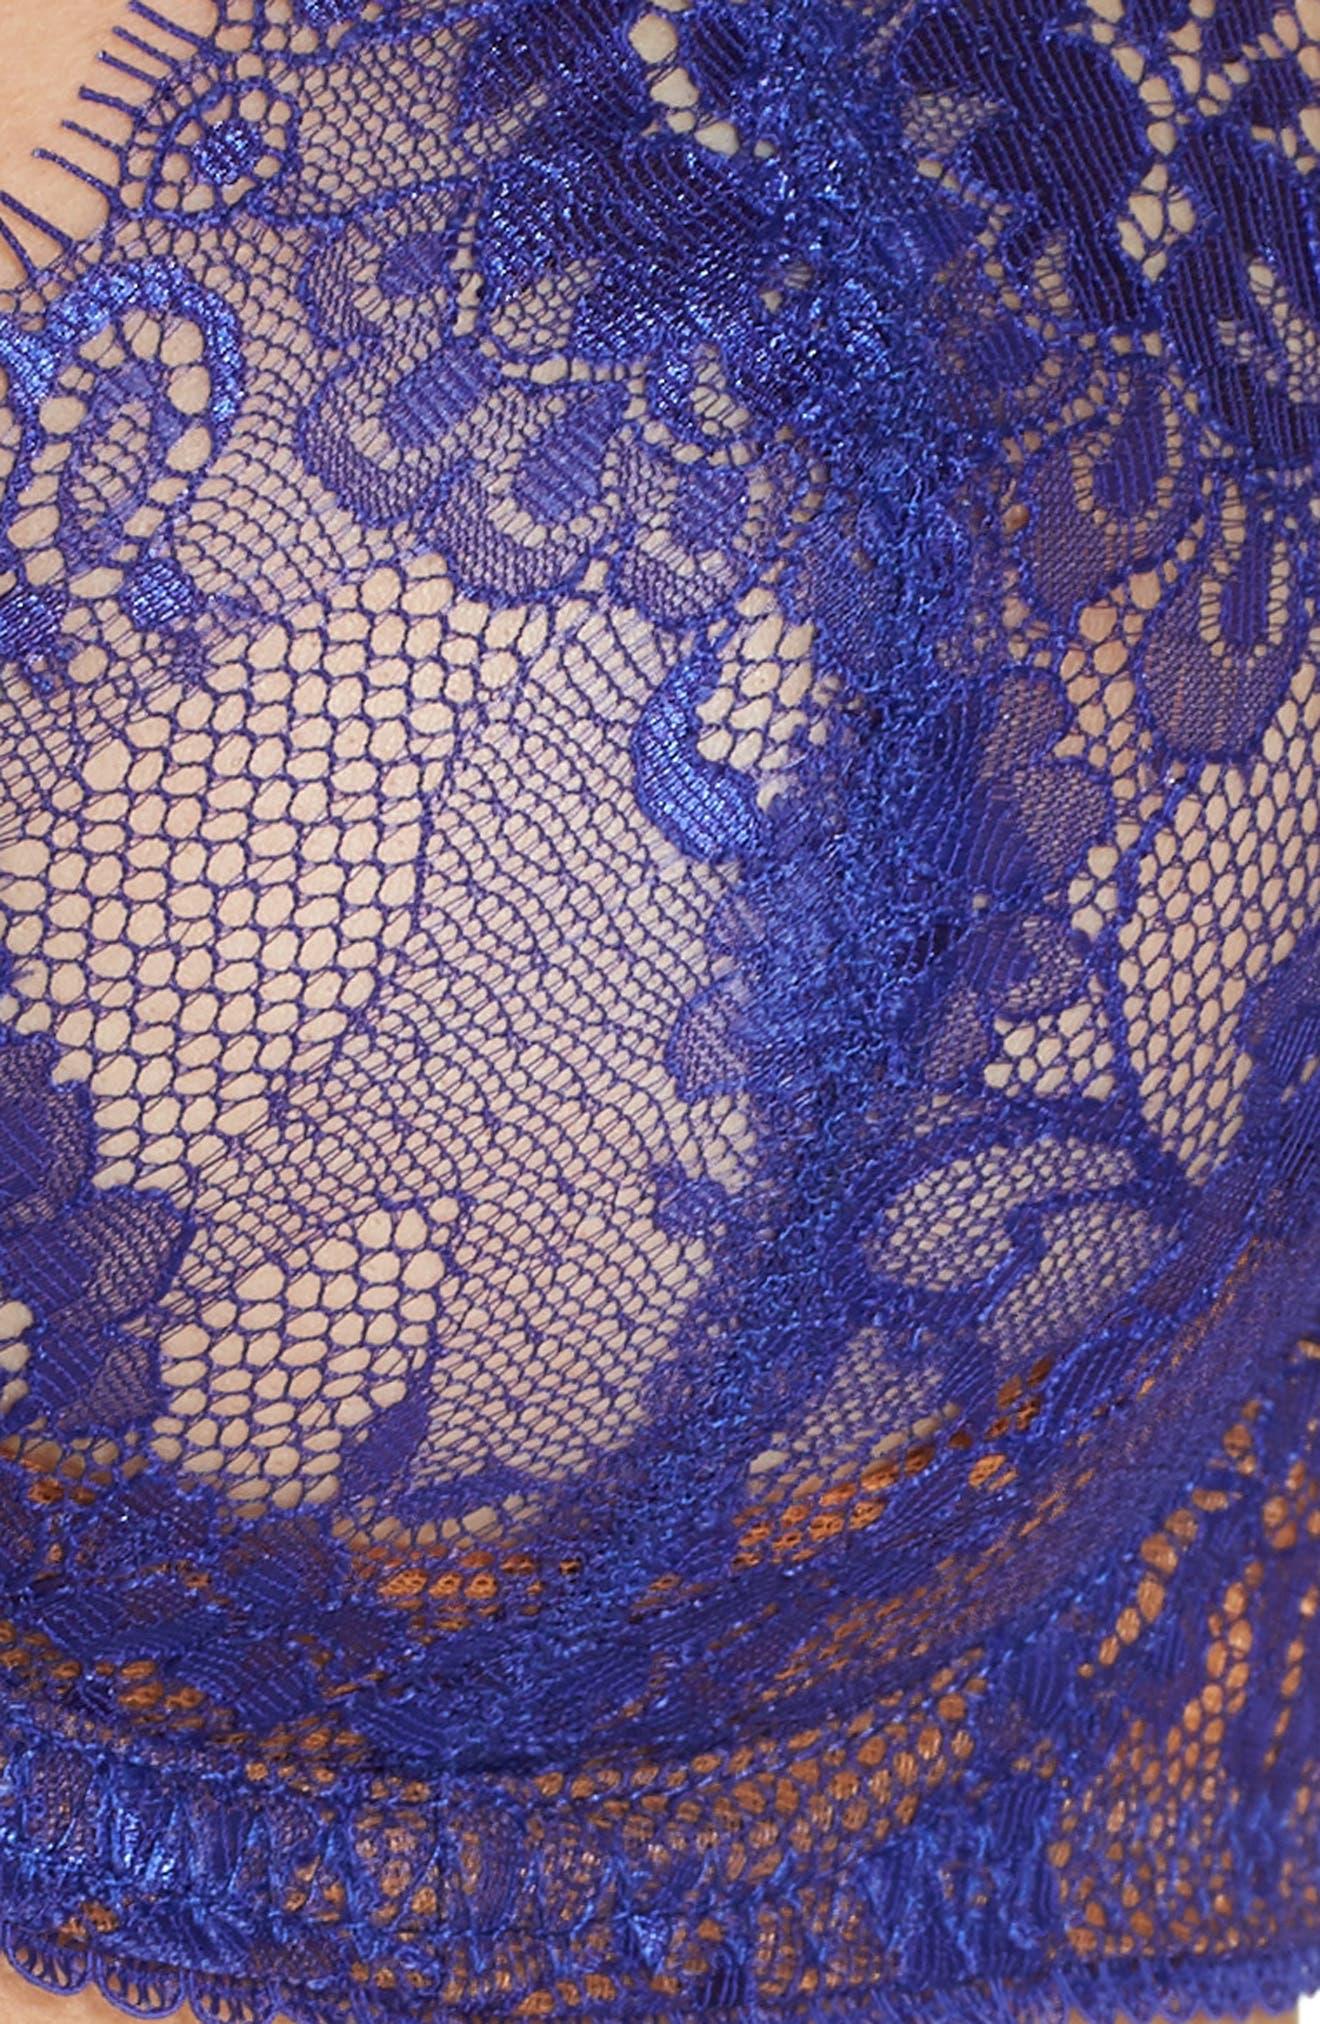 Savior Faire Sheers Underwire Lace Bra,                             Alternate thumbnail 6, color,                             ELECTRIC/ COPPER